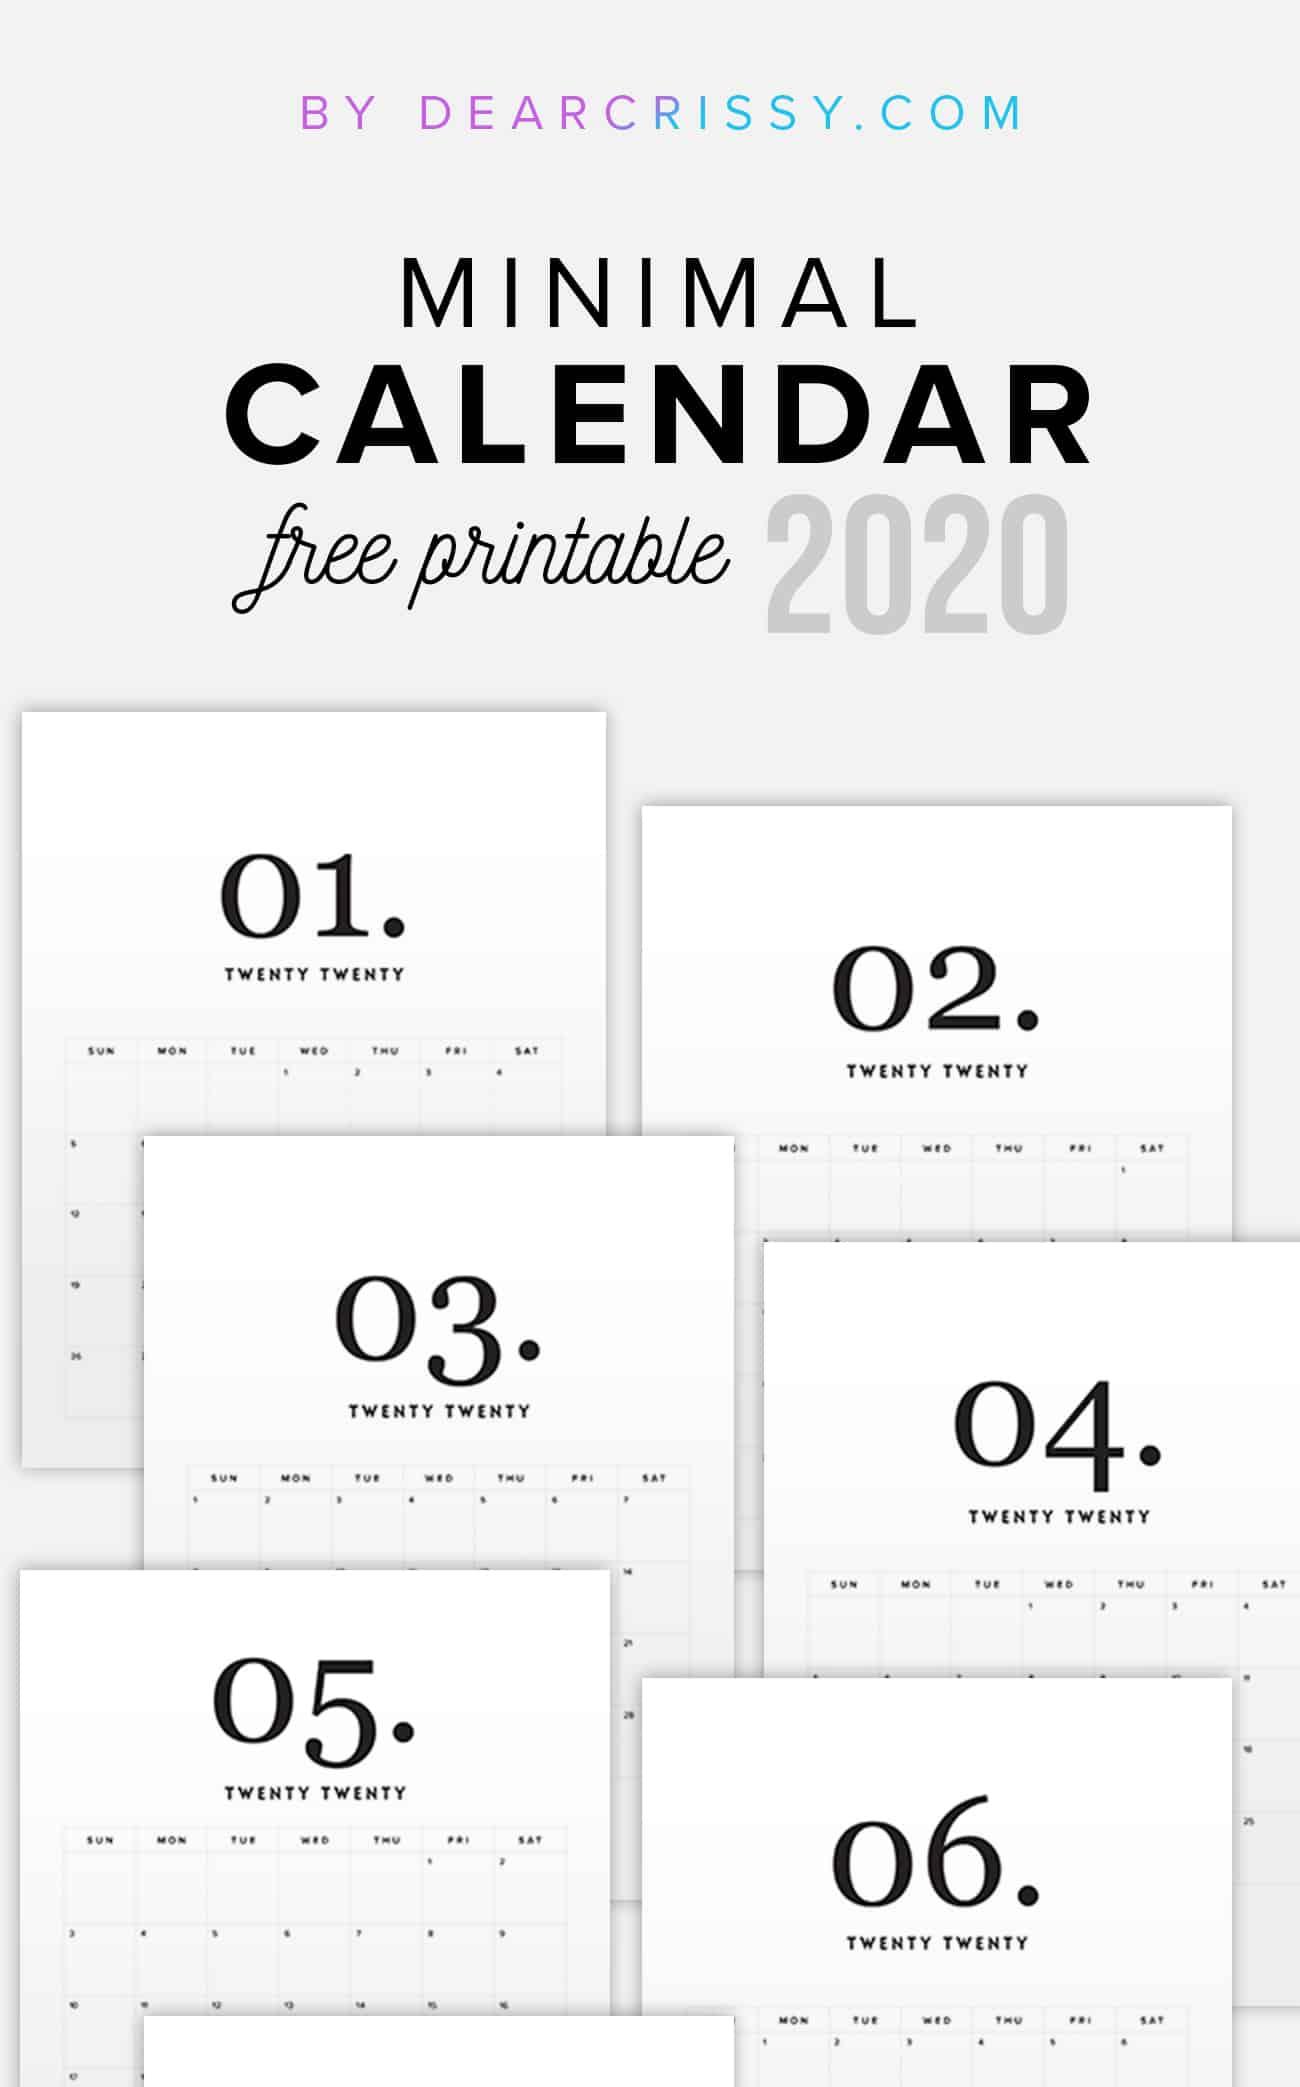 Mini Calendar Template from dearcrissy.com